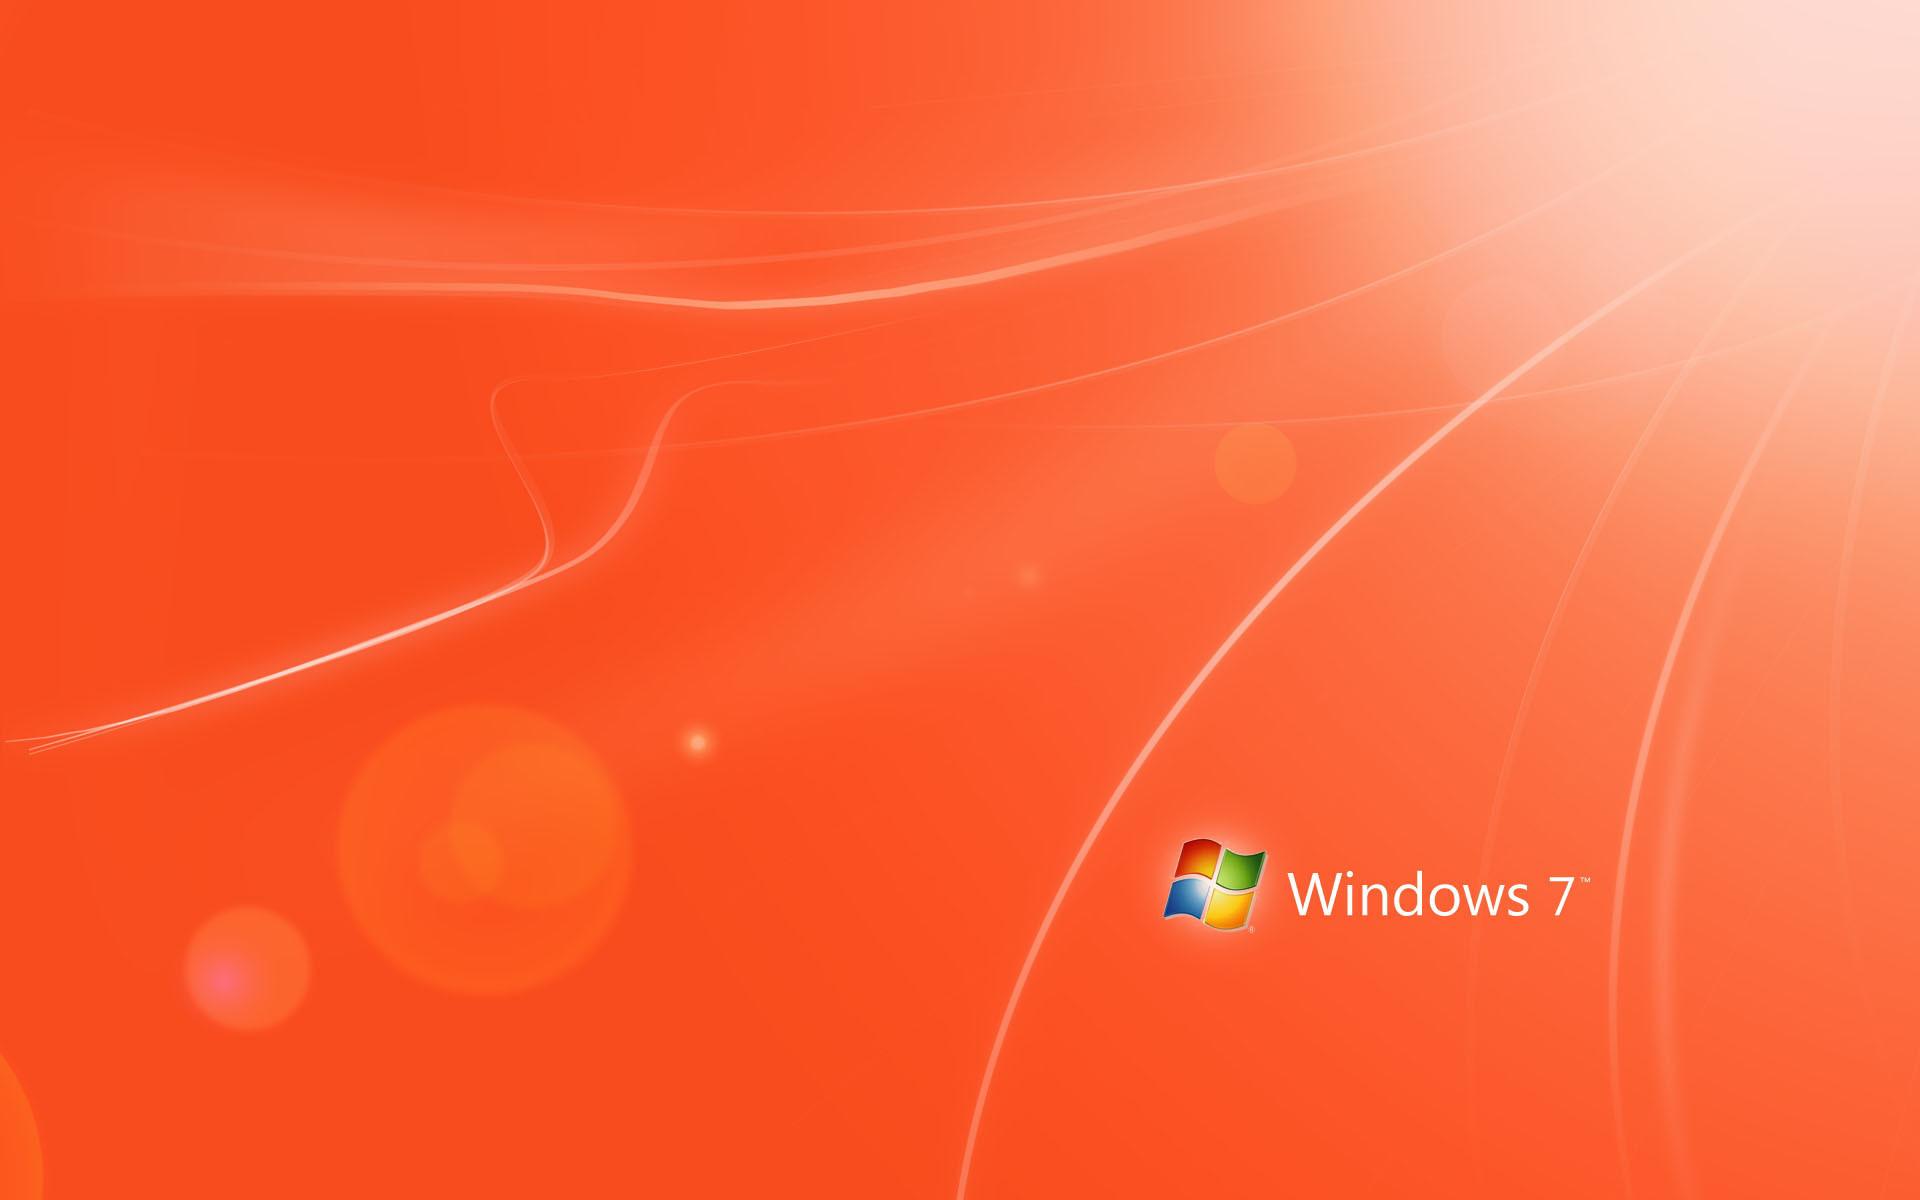 Orange Windows 7 WallPaper HD – https://imashon.com/brands-